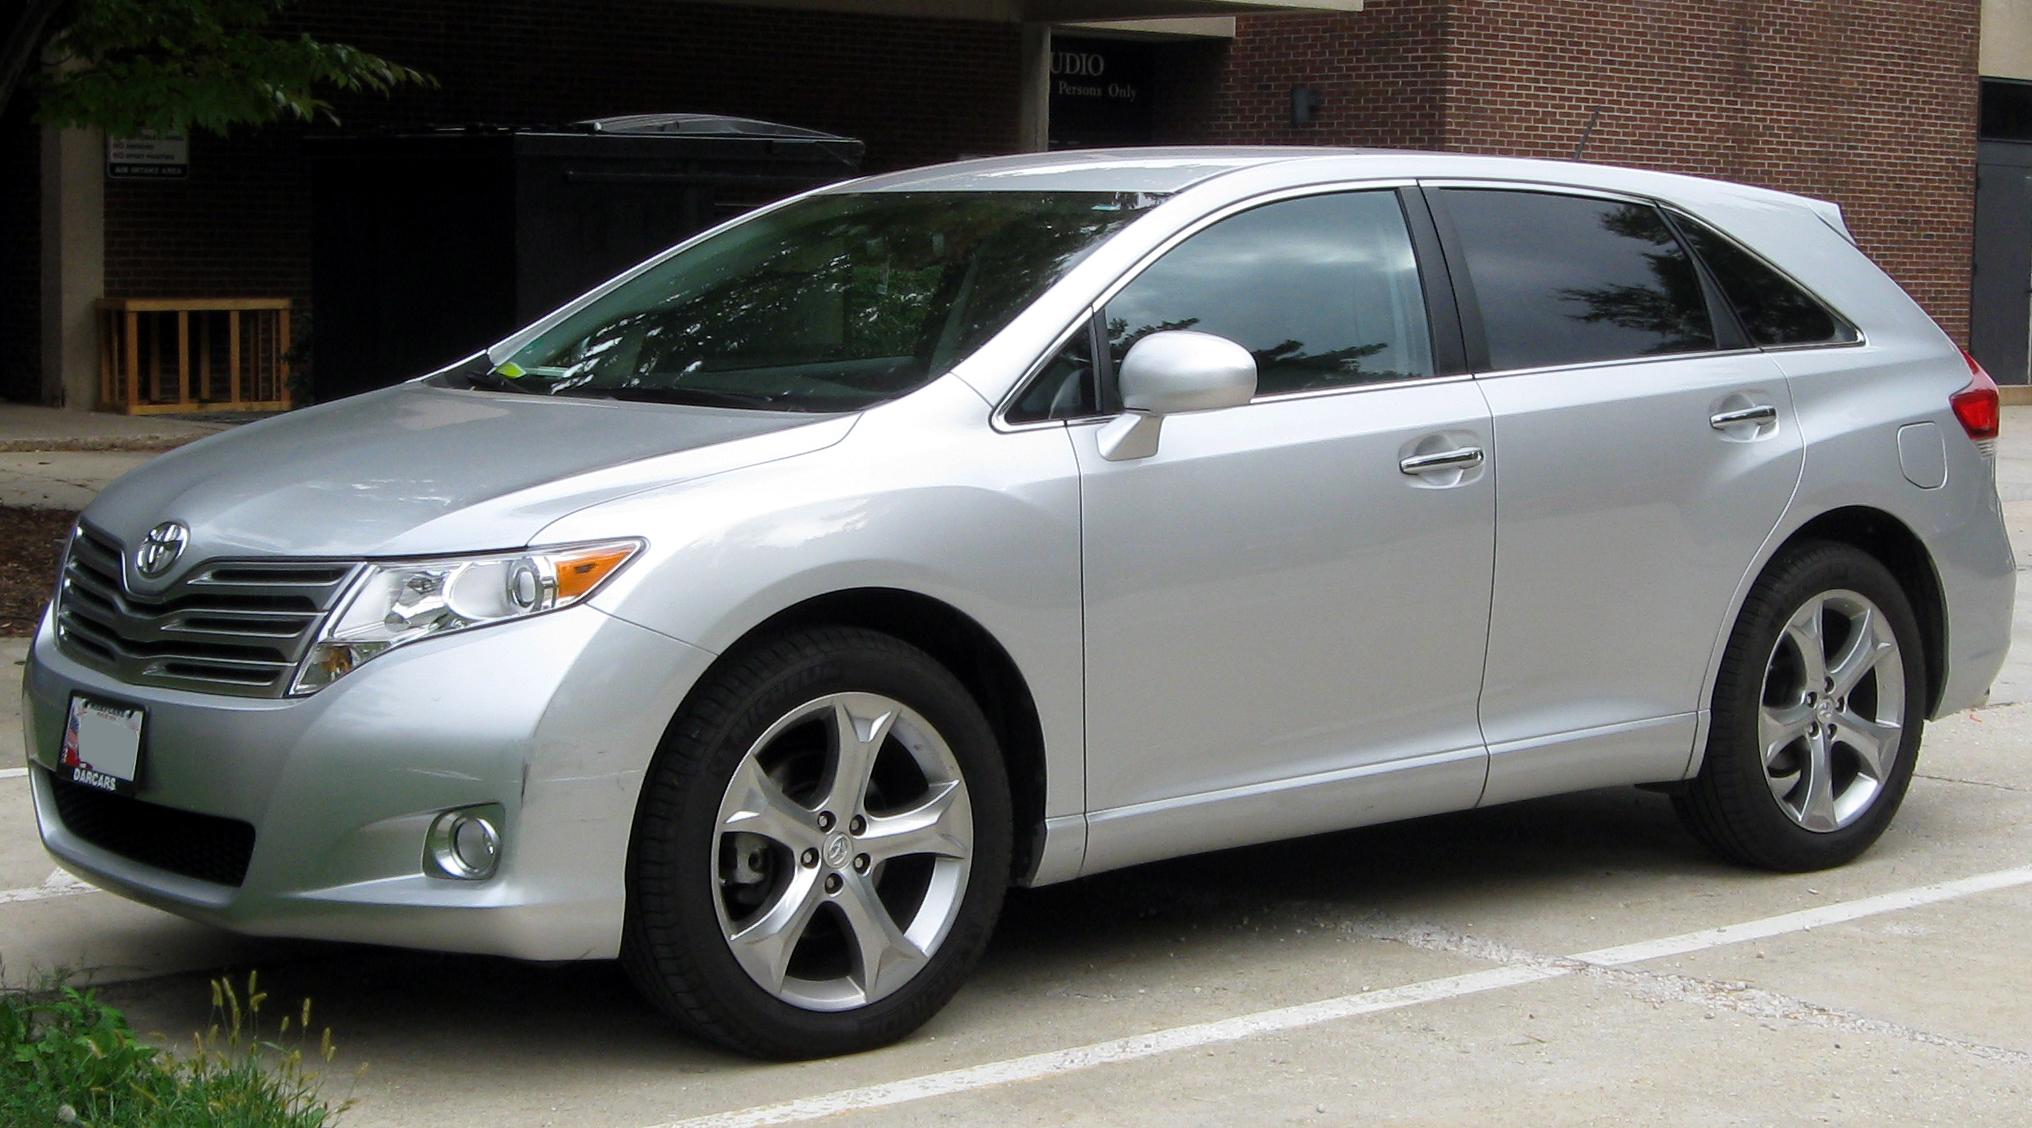 File:Toyota Venza -- 10-20-2010.jpg